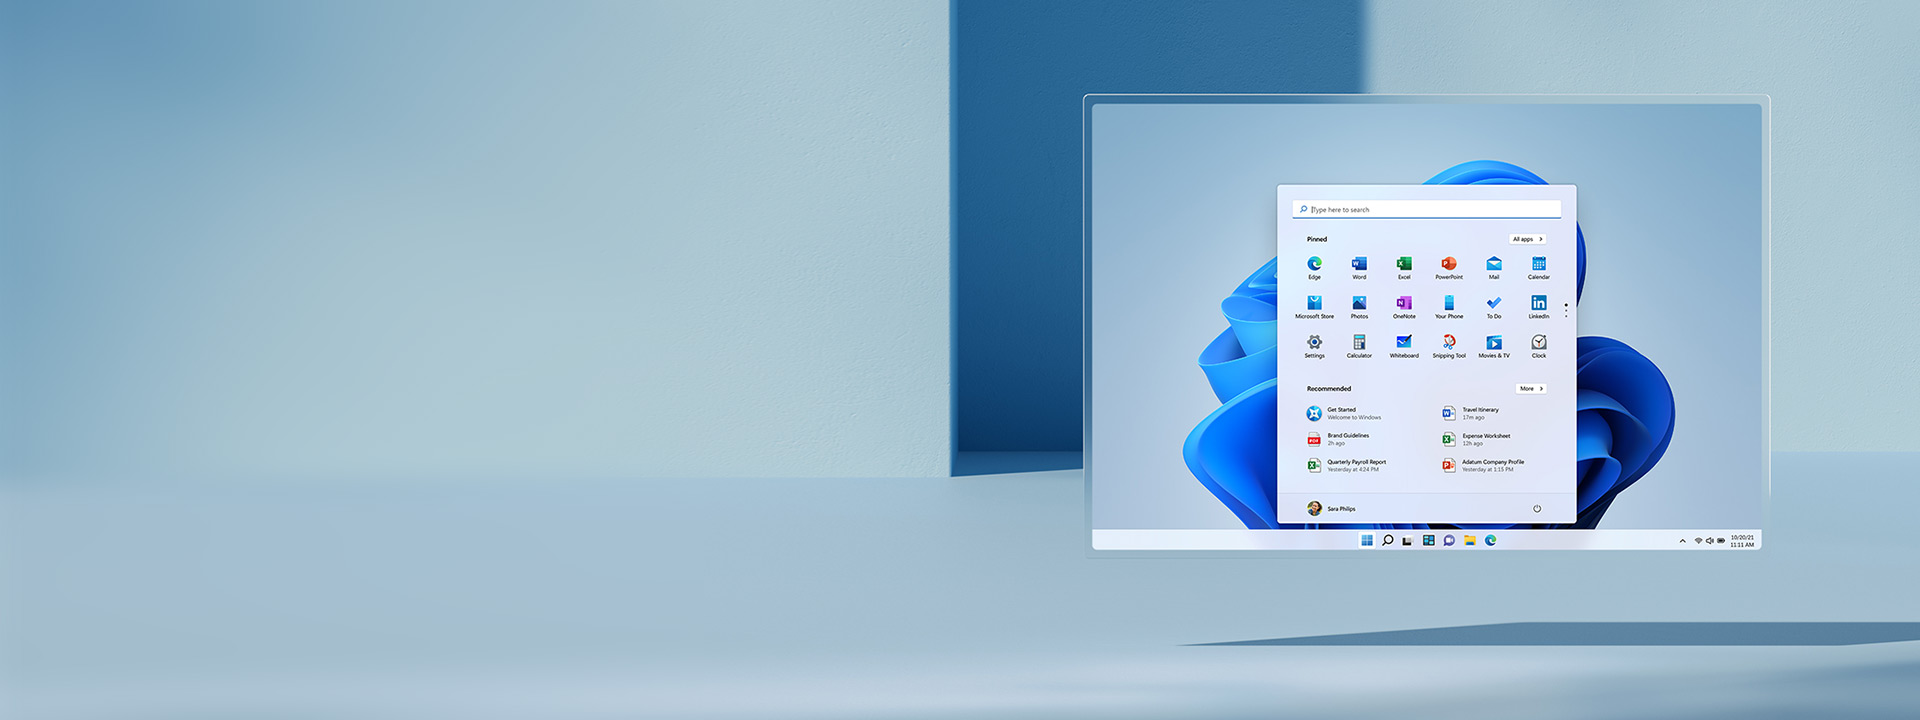 Windows 11 の写真